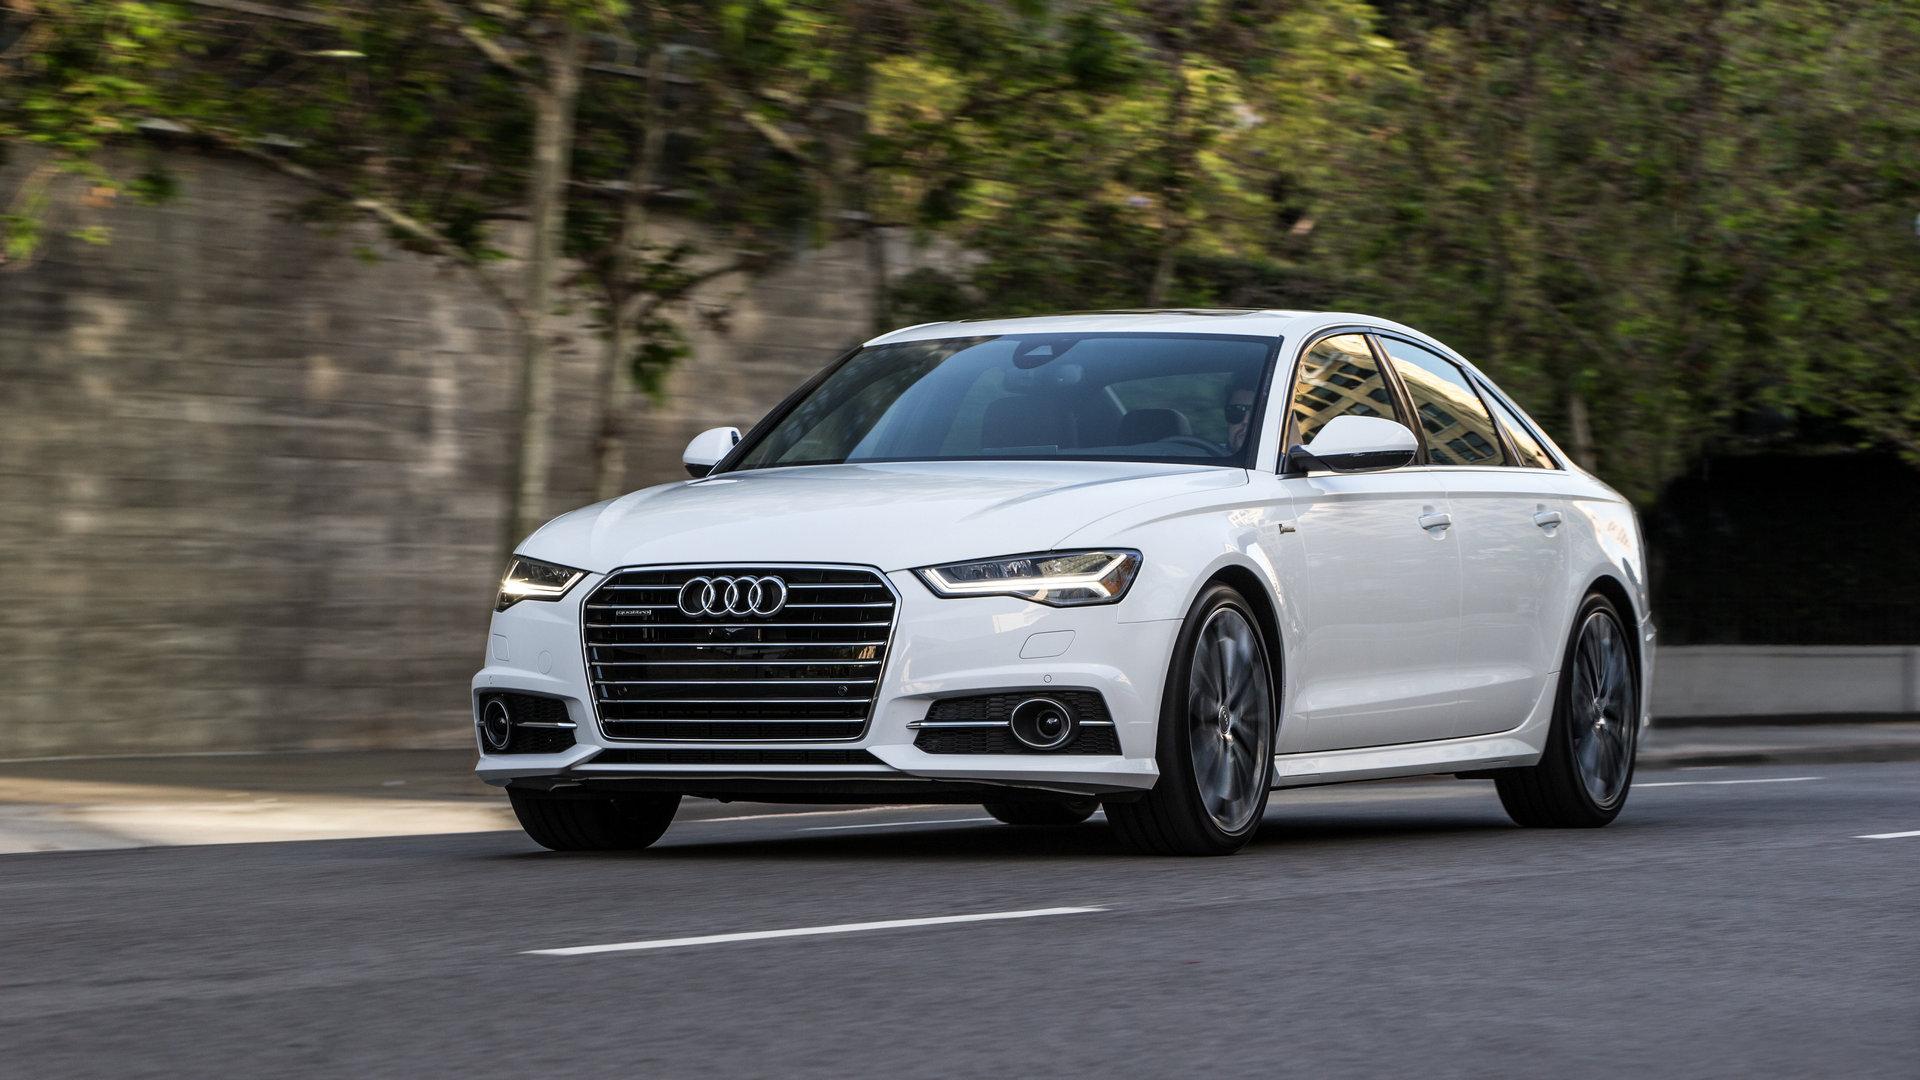 2016 Audi A6 Sedan © Volkswagen Group